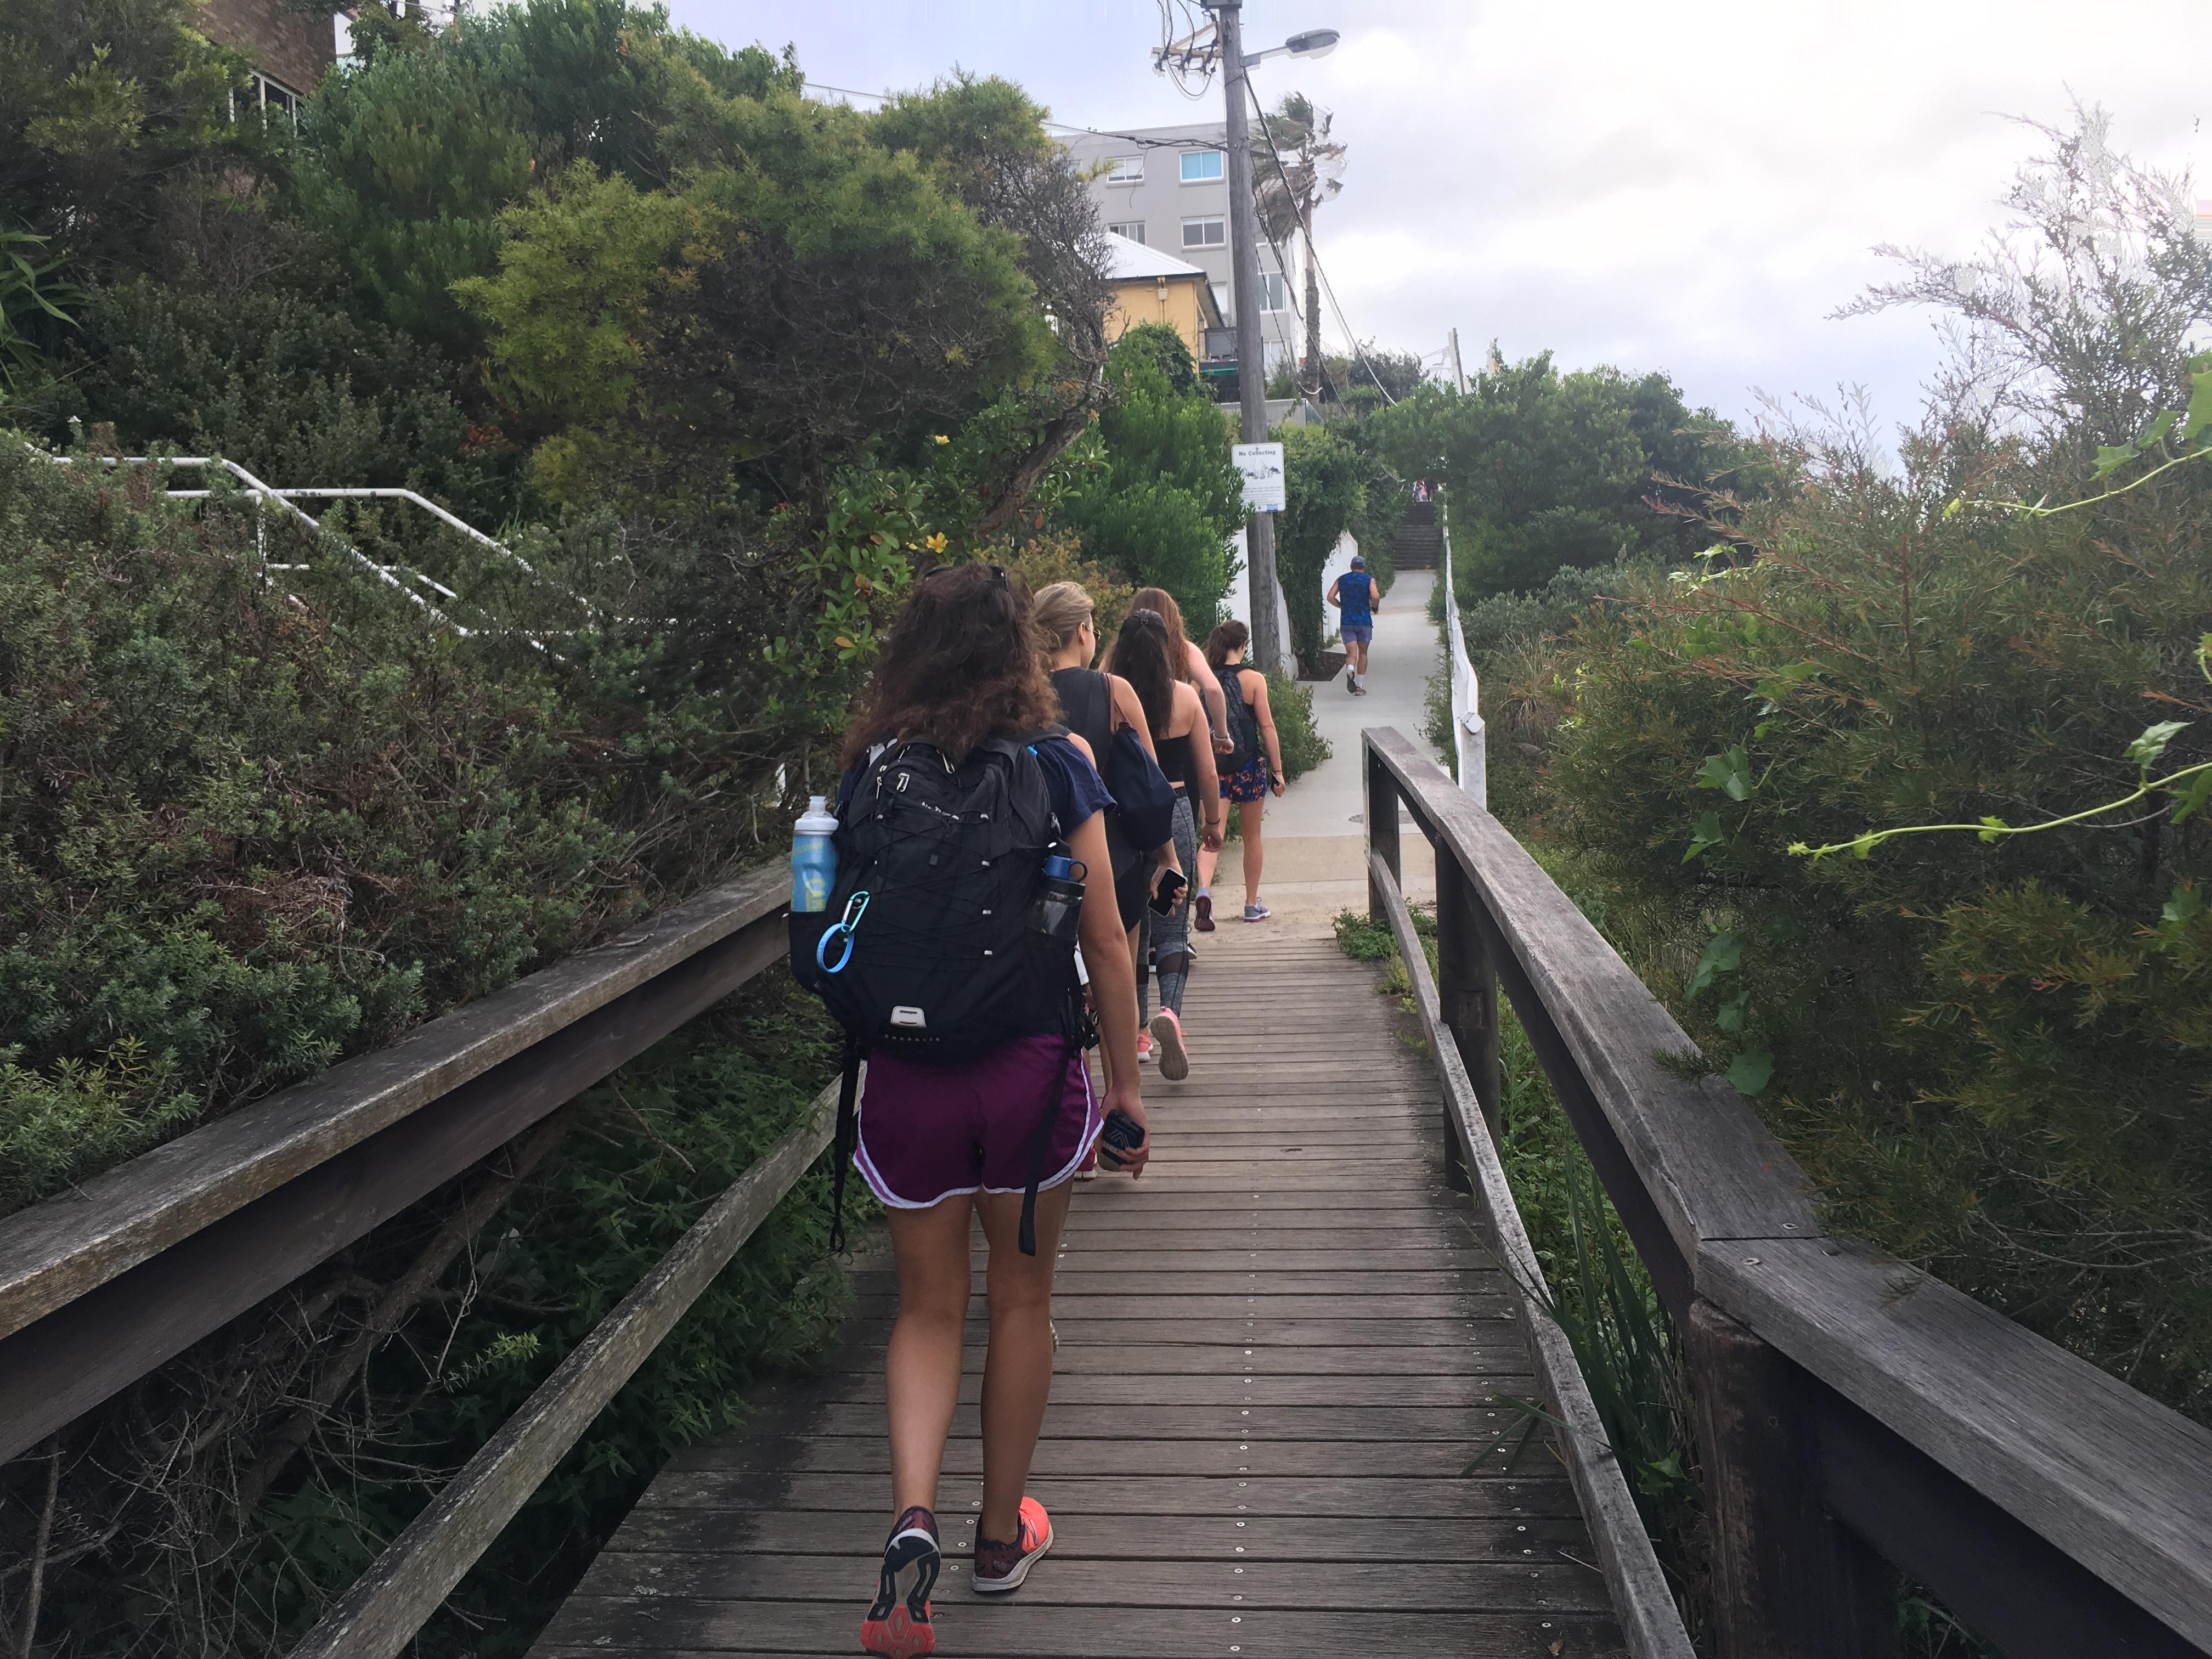 CAPAStudyAbroad_Sydney_Spring2017_From Colin Gilbert - Bondi to Coogee Walk - 1.jpg